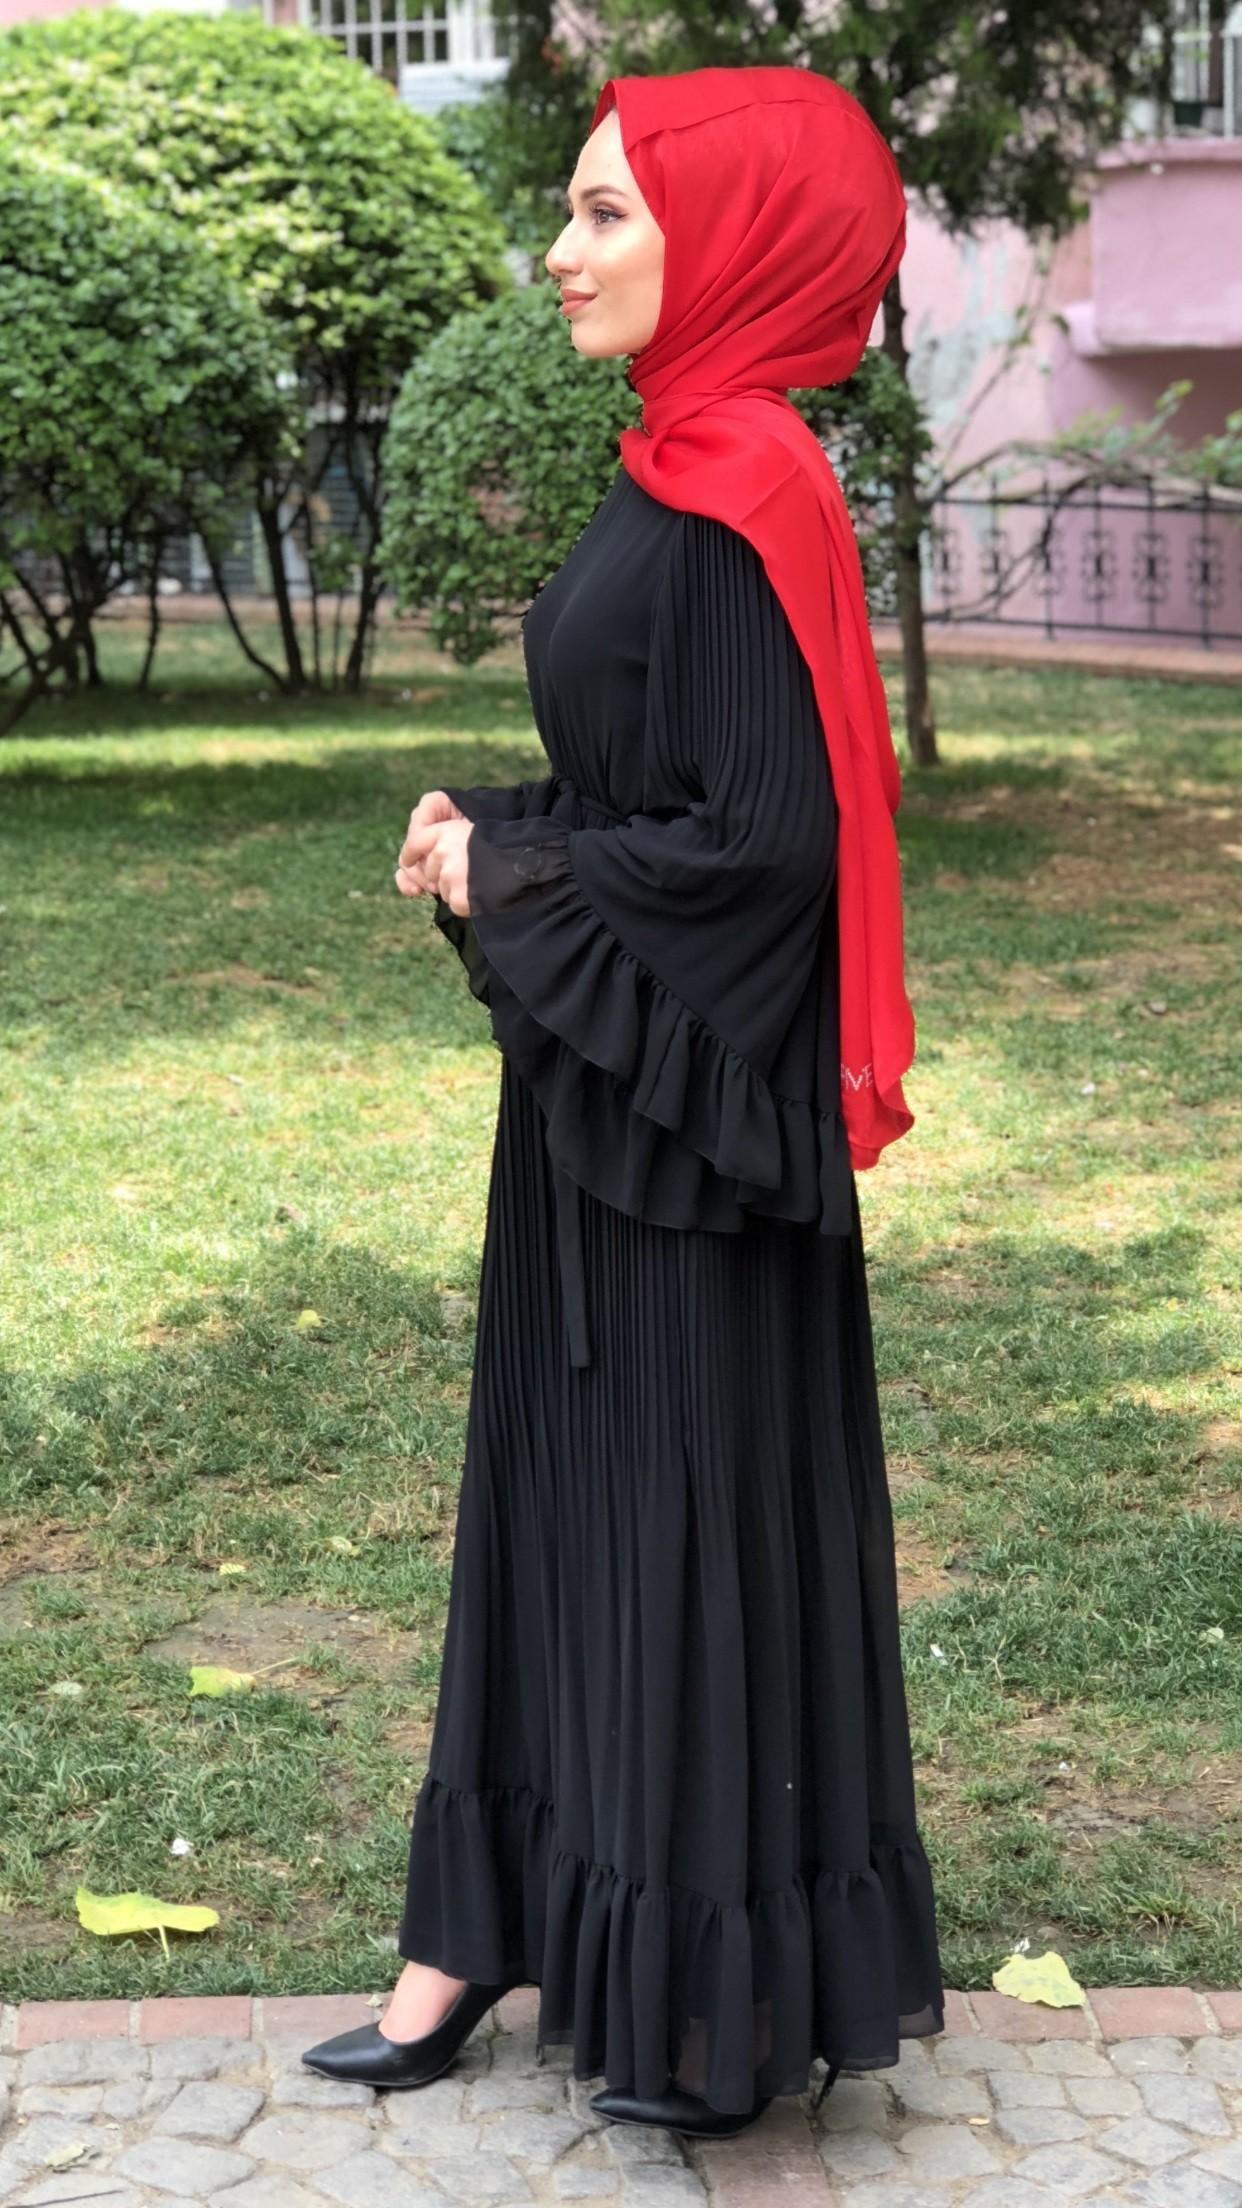 GENİŞ KOL ELBİSE